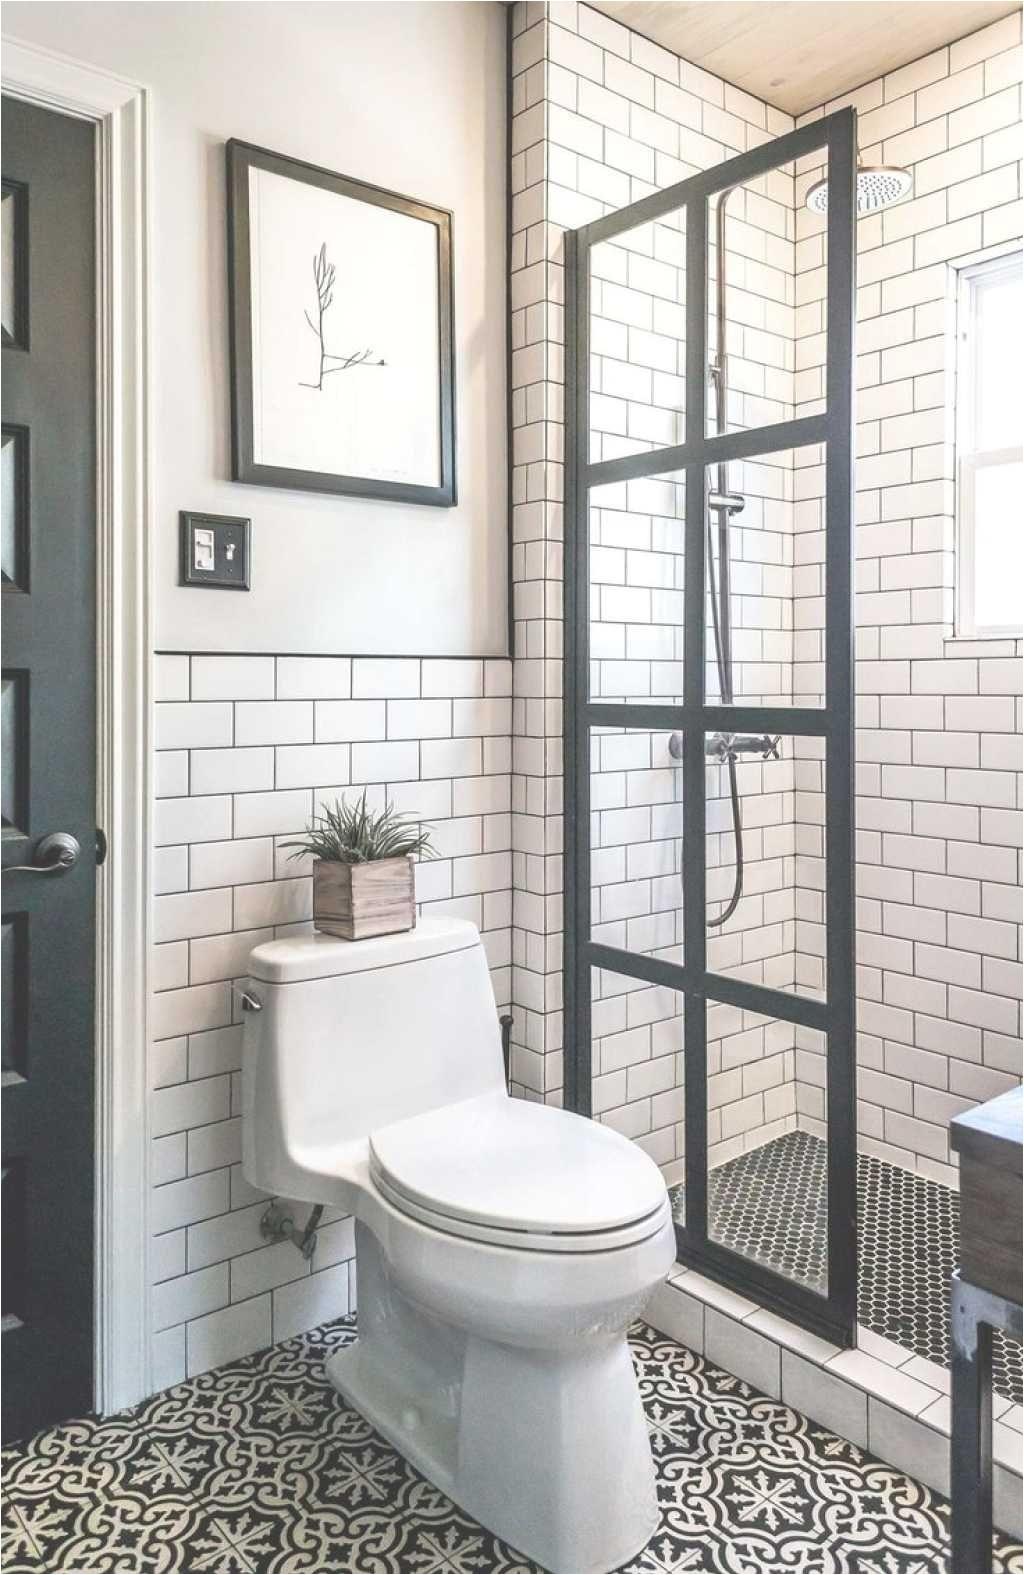 Old World Bathroom Design Ideas Pin by Kelsey Benne On Master Bathroom Remodel Ideas In 2018